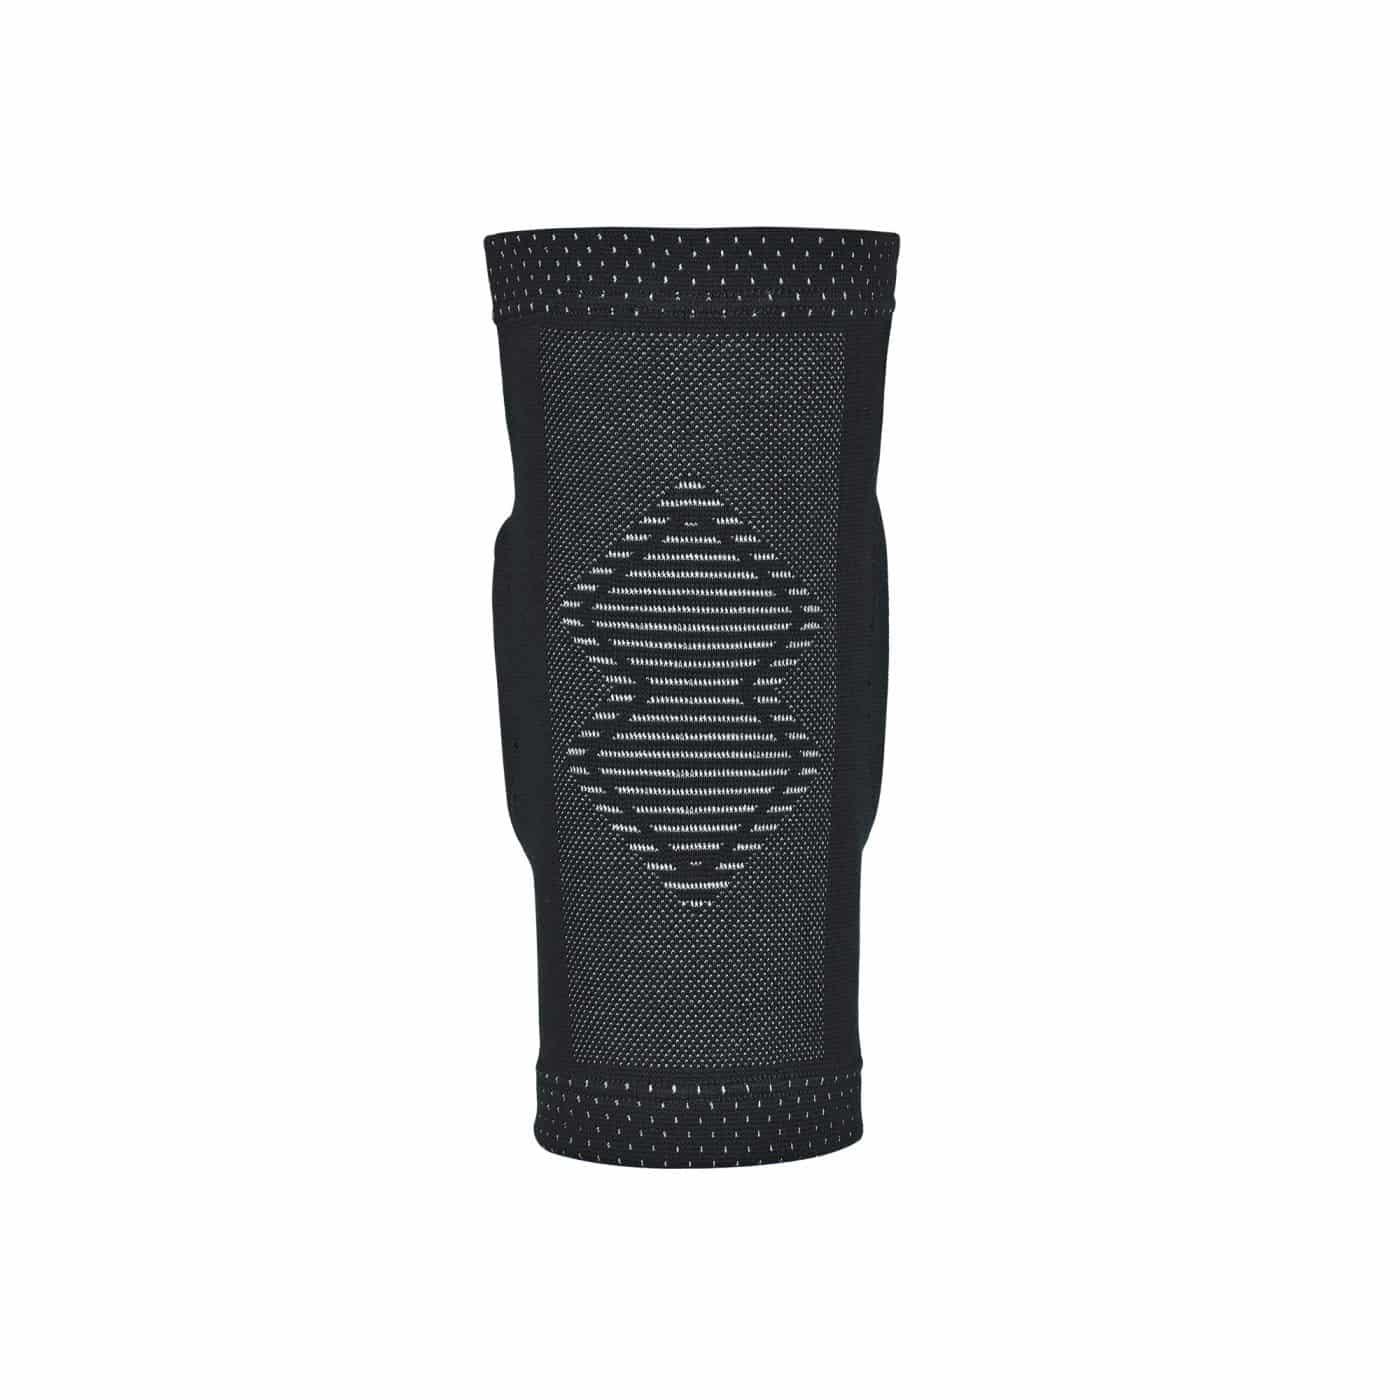 errea-tokyo-evolution-2020-genouillères-volley-knee-pad-volleypack-5